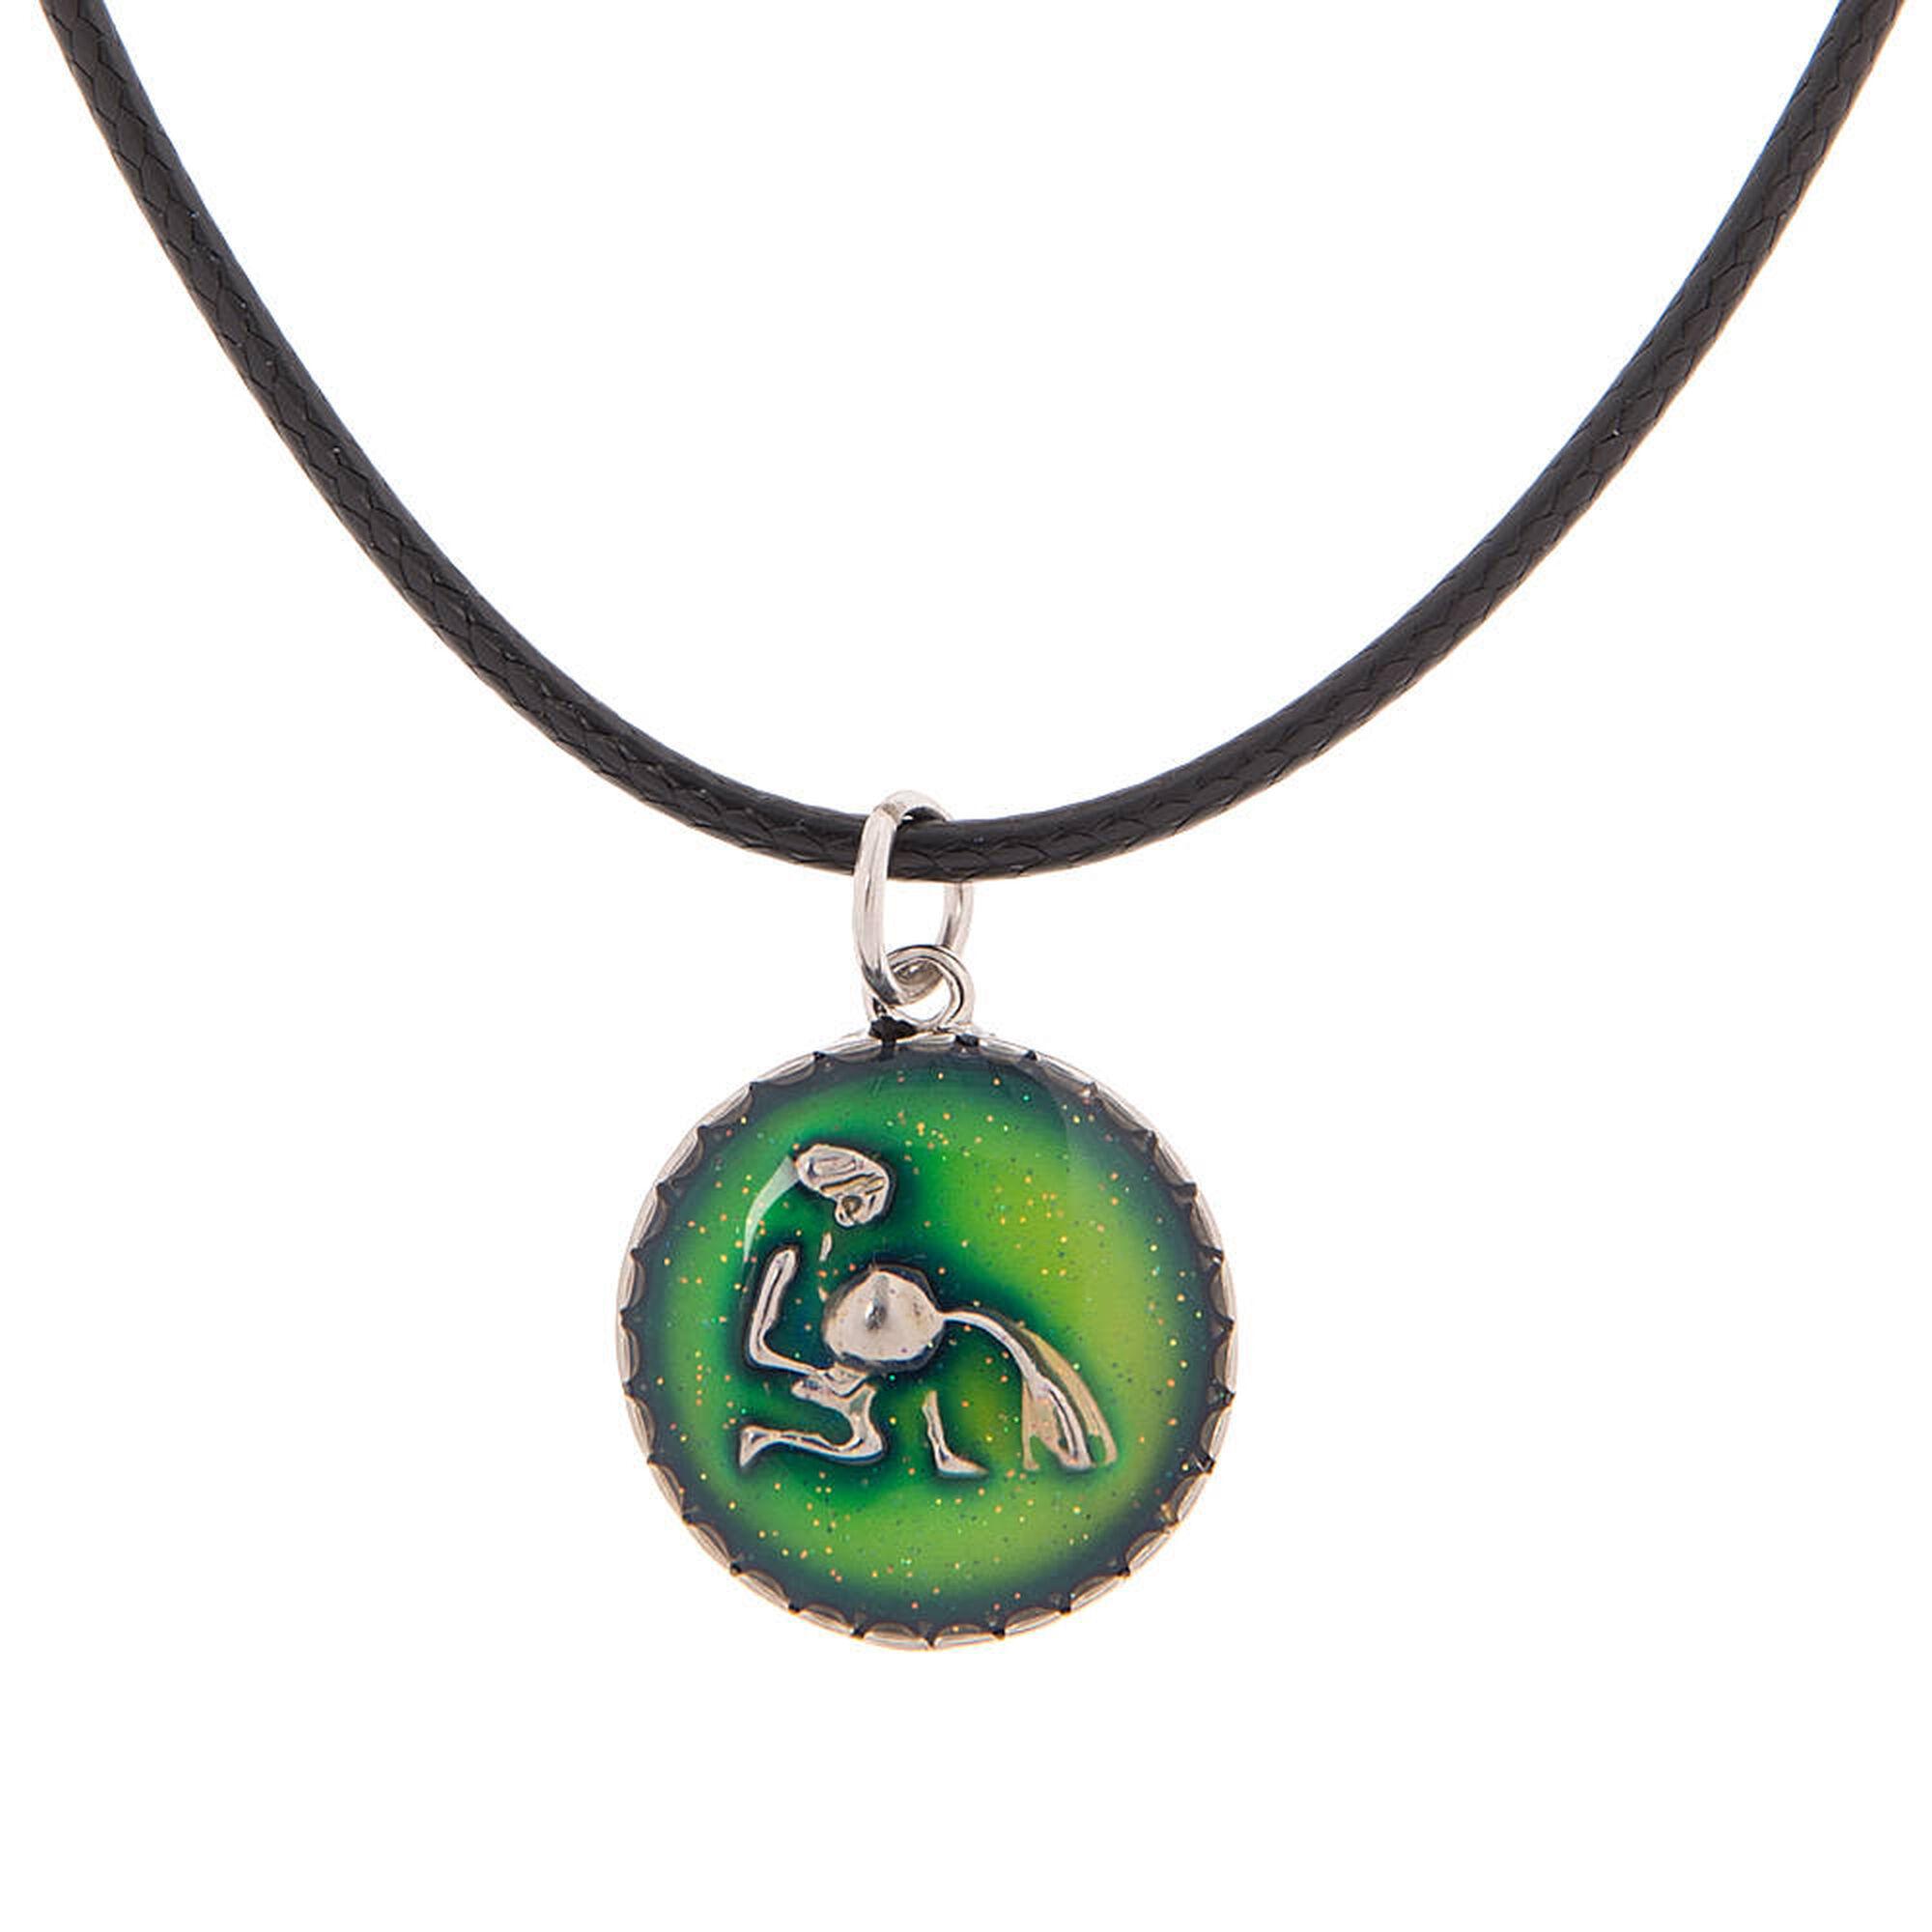 Aquarius zodiac mood pendant cord necklace claires us aquarius zodiac mood pendant cord necklace mozeypictures Image collections